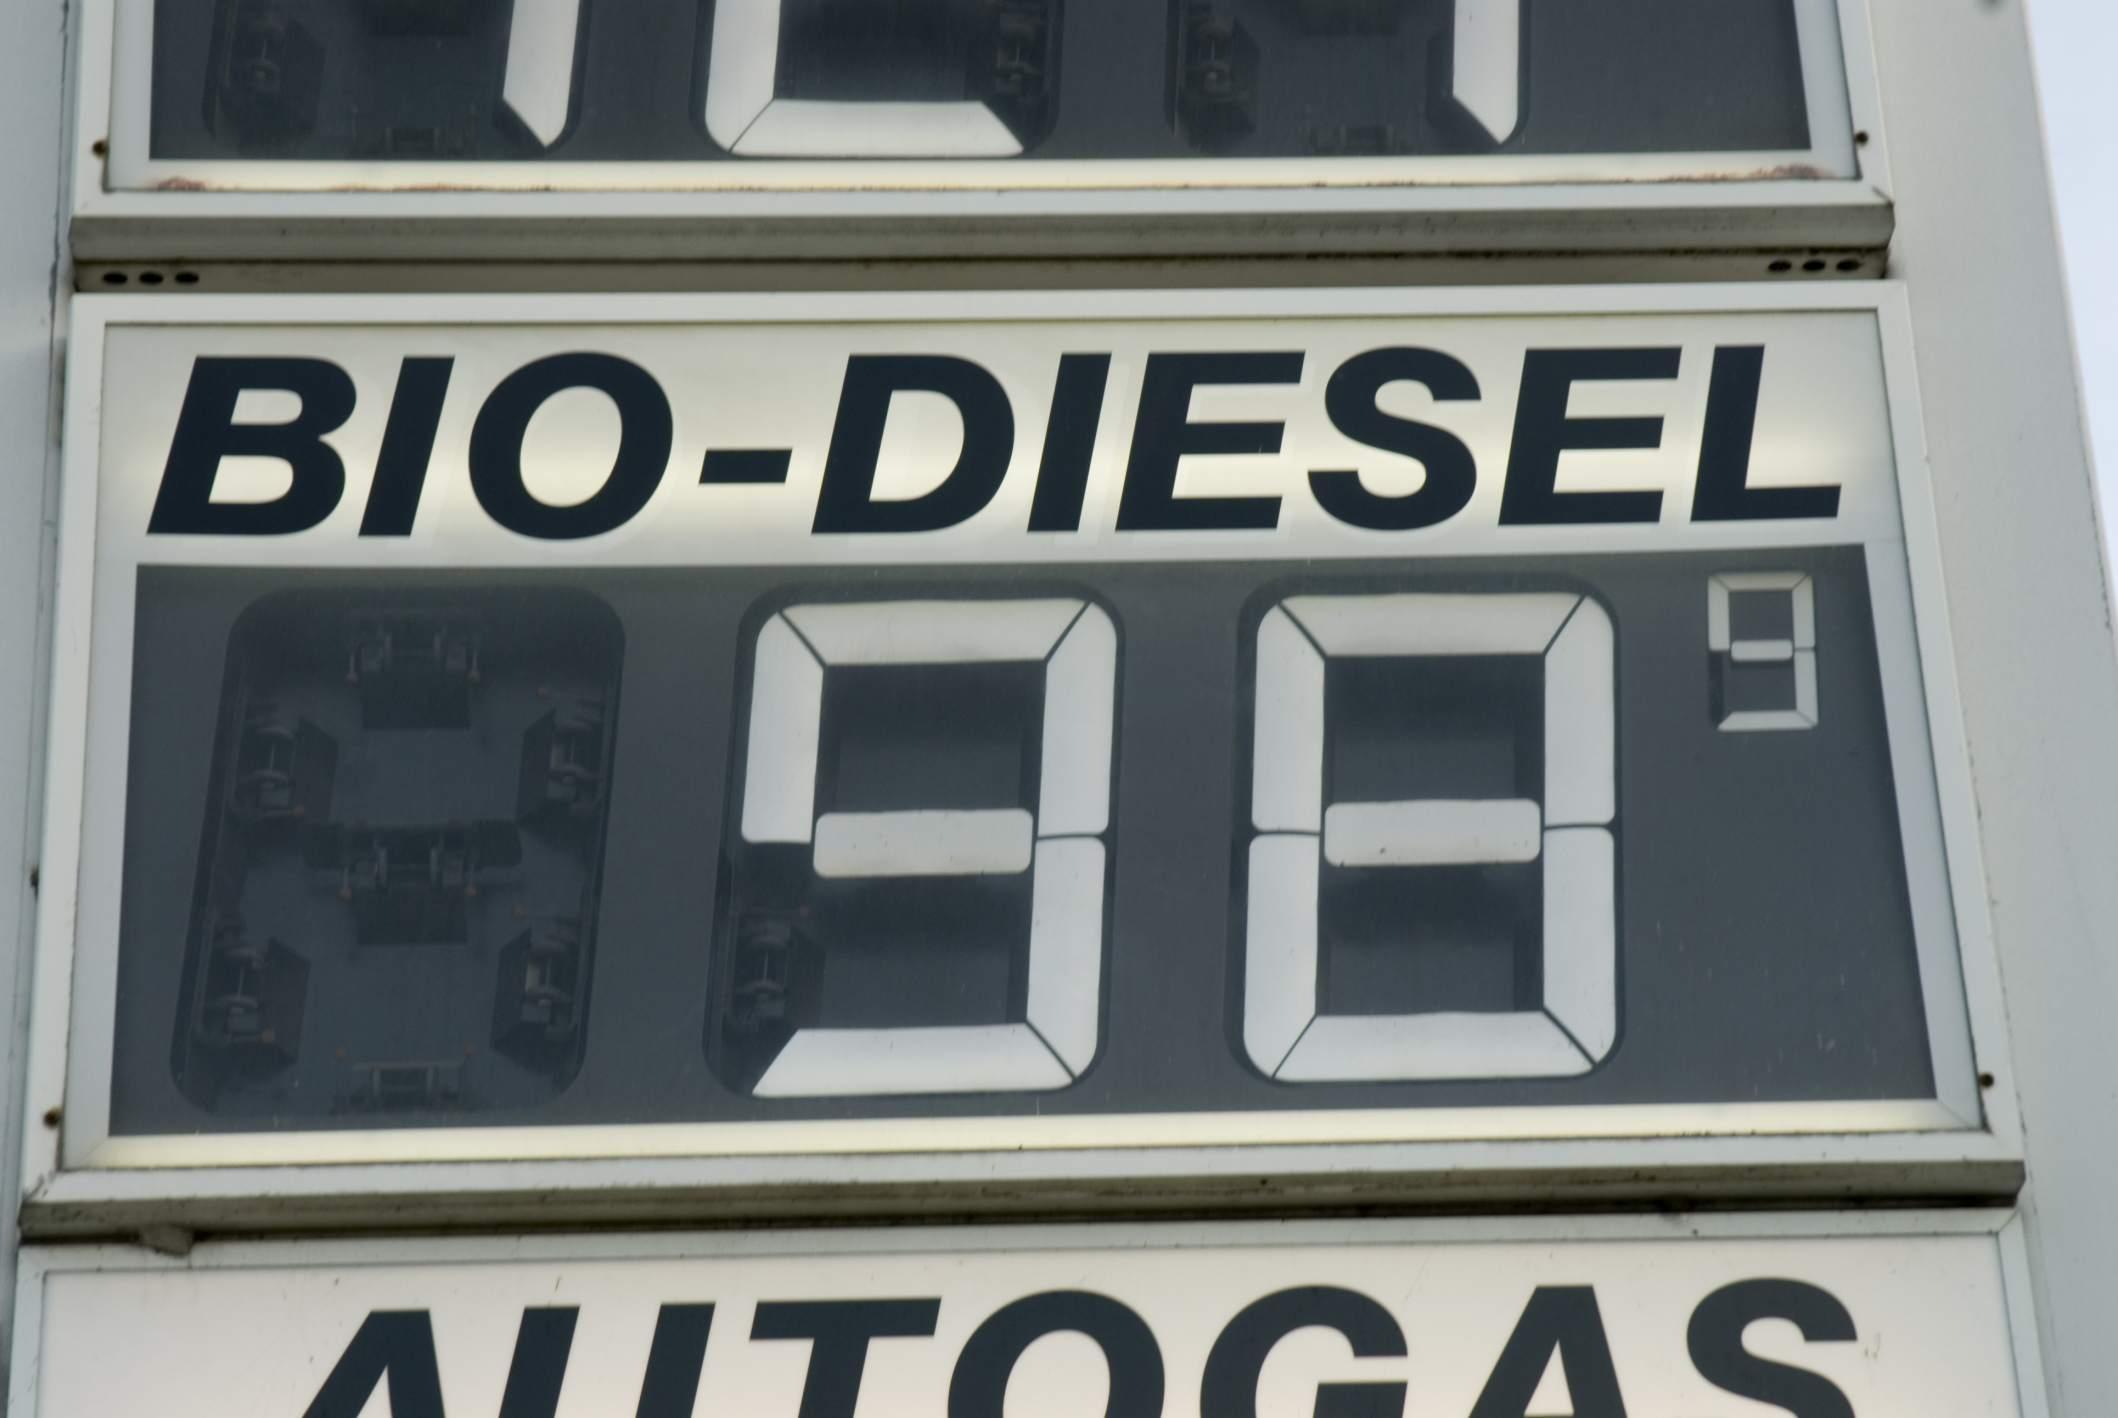 Biodiesel price sign